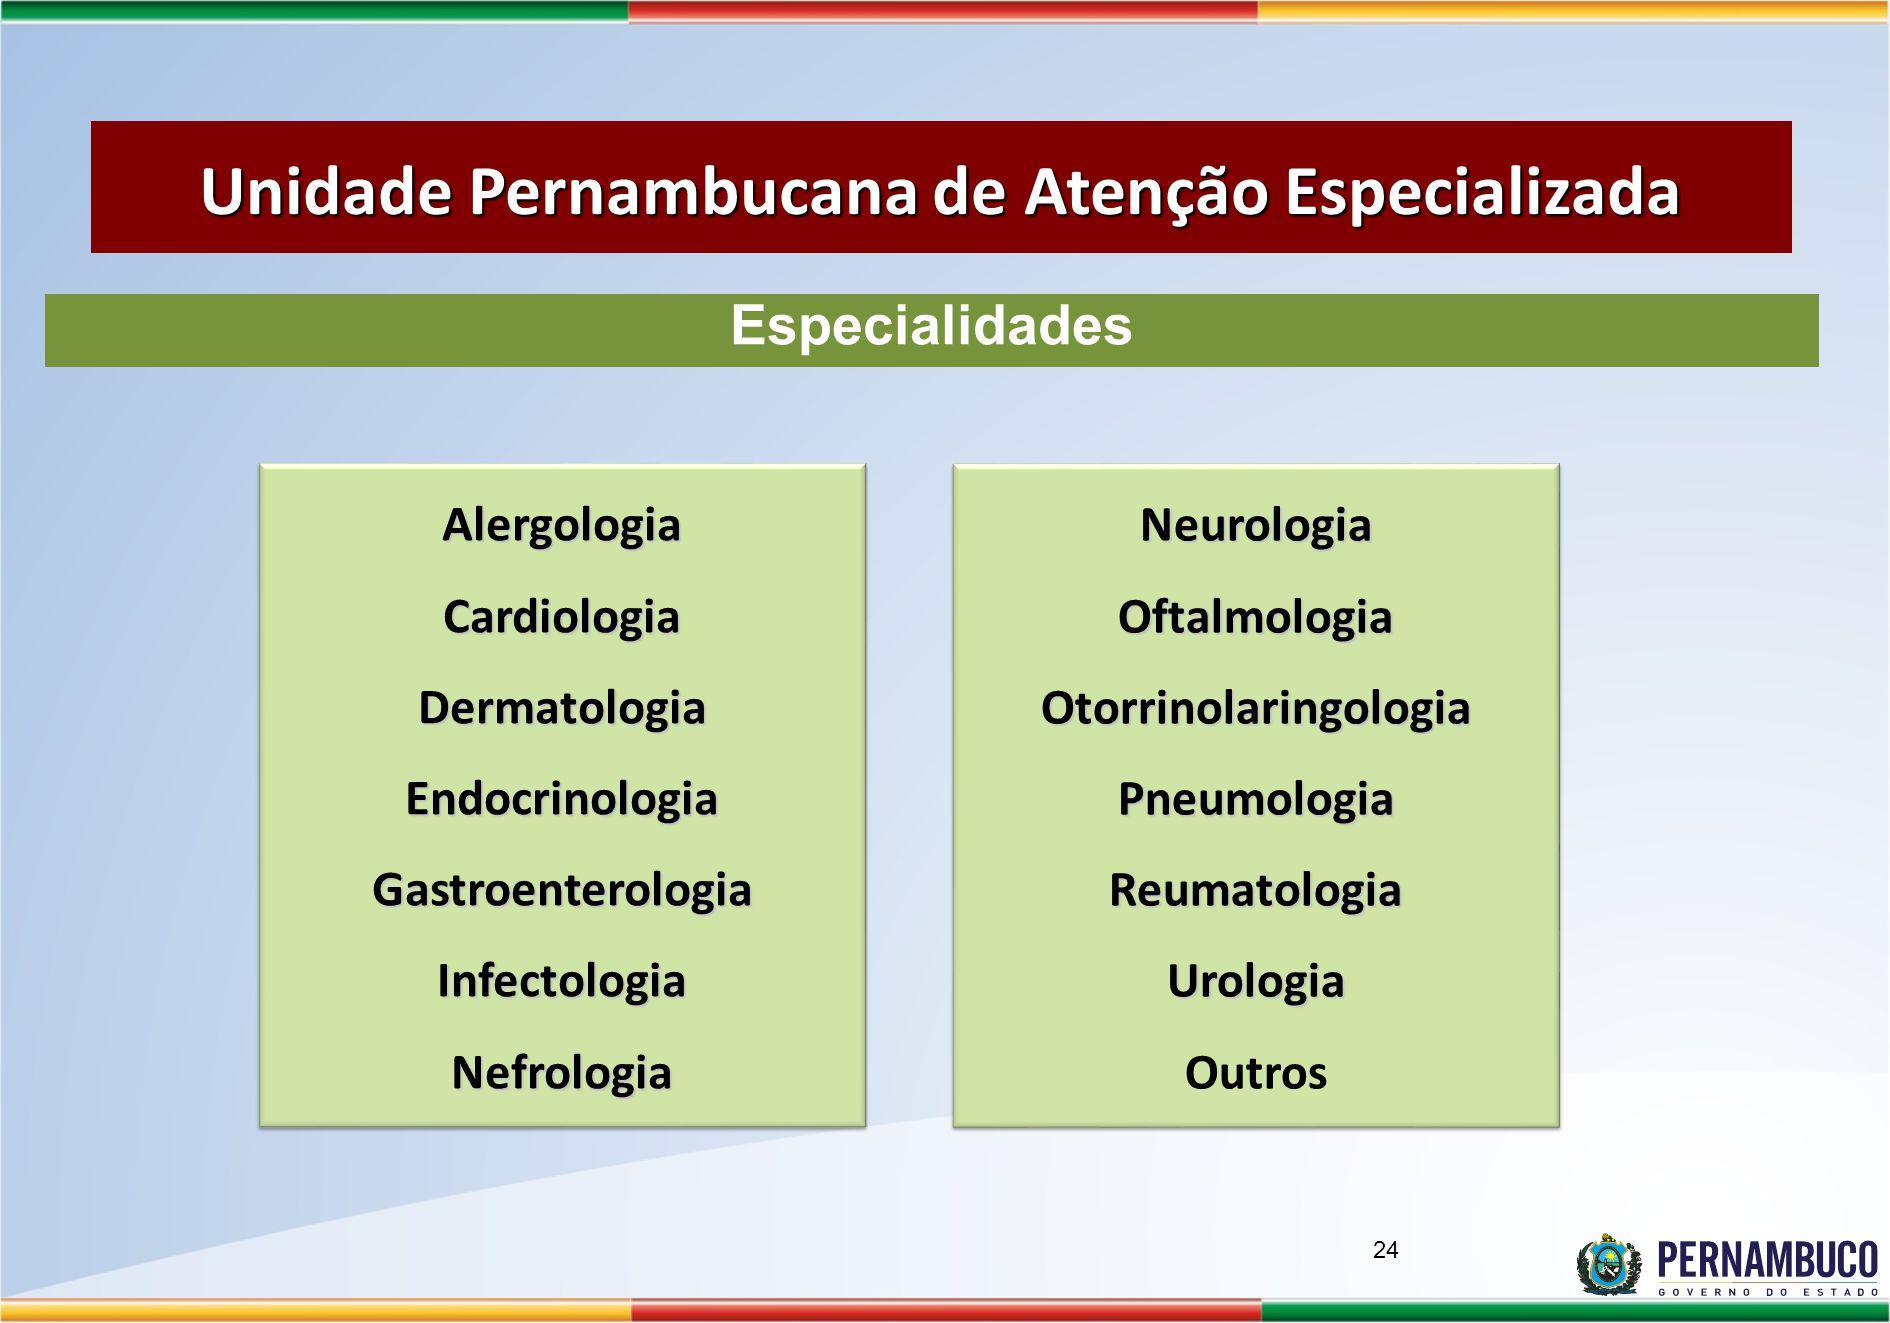 AlergologiaCardiologiaDermatologiaEndocrinologiaGastroenterologiaInfectologiaNefrologiaAlergologiaCardiologiaDermatologiaEndocrinologiaGastroenterologiaInfectologiaNefrologiaNeurologiaOftalmologiaOtorrinolaringologiaPneumologiaReumatologiaUrologia OutrosNeurologiaOftalmologiaOtorrinolaringologiaPneumologiaReumatologiaUrologia Especialidades Unidade Pernambucana de Atenção Especializada 24